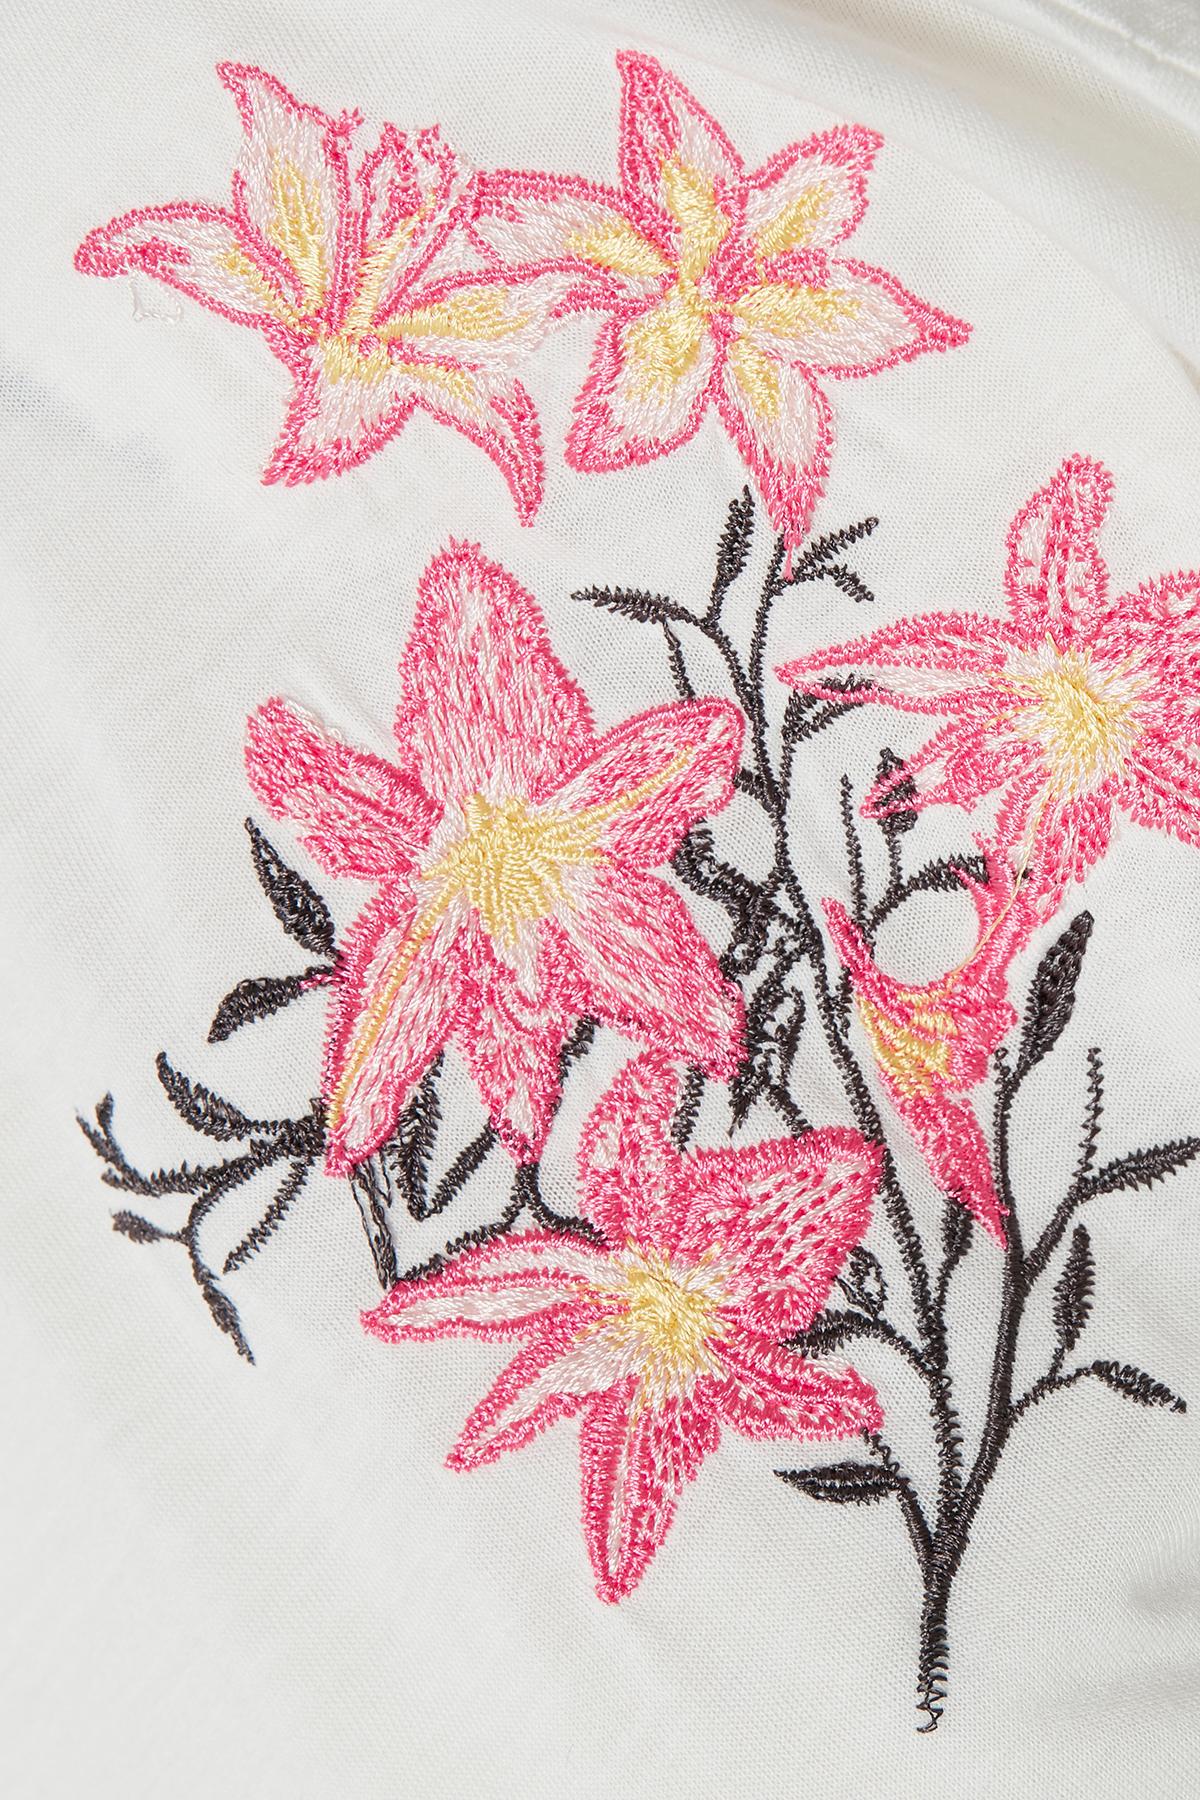 Wollweiss Kurzarm T-Shirt von Bon'A Parte – Shoppen SieWollweiss Kurzarm T-Shirt ab Gr. S-2XL hier